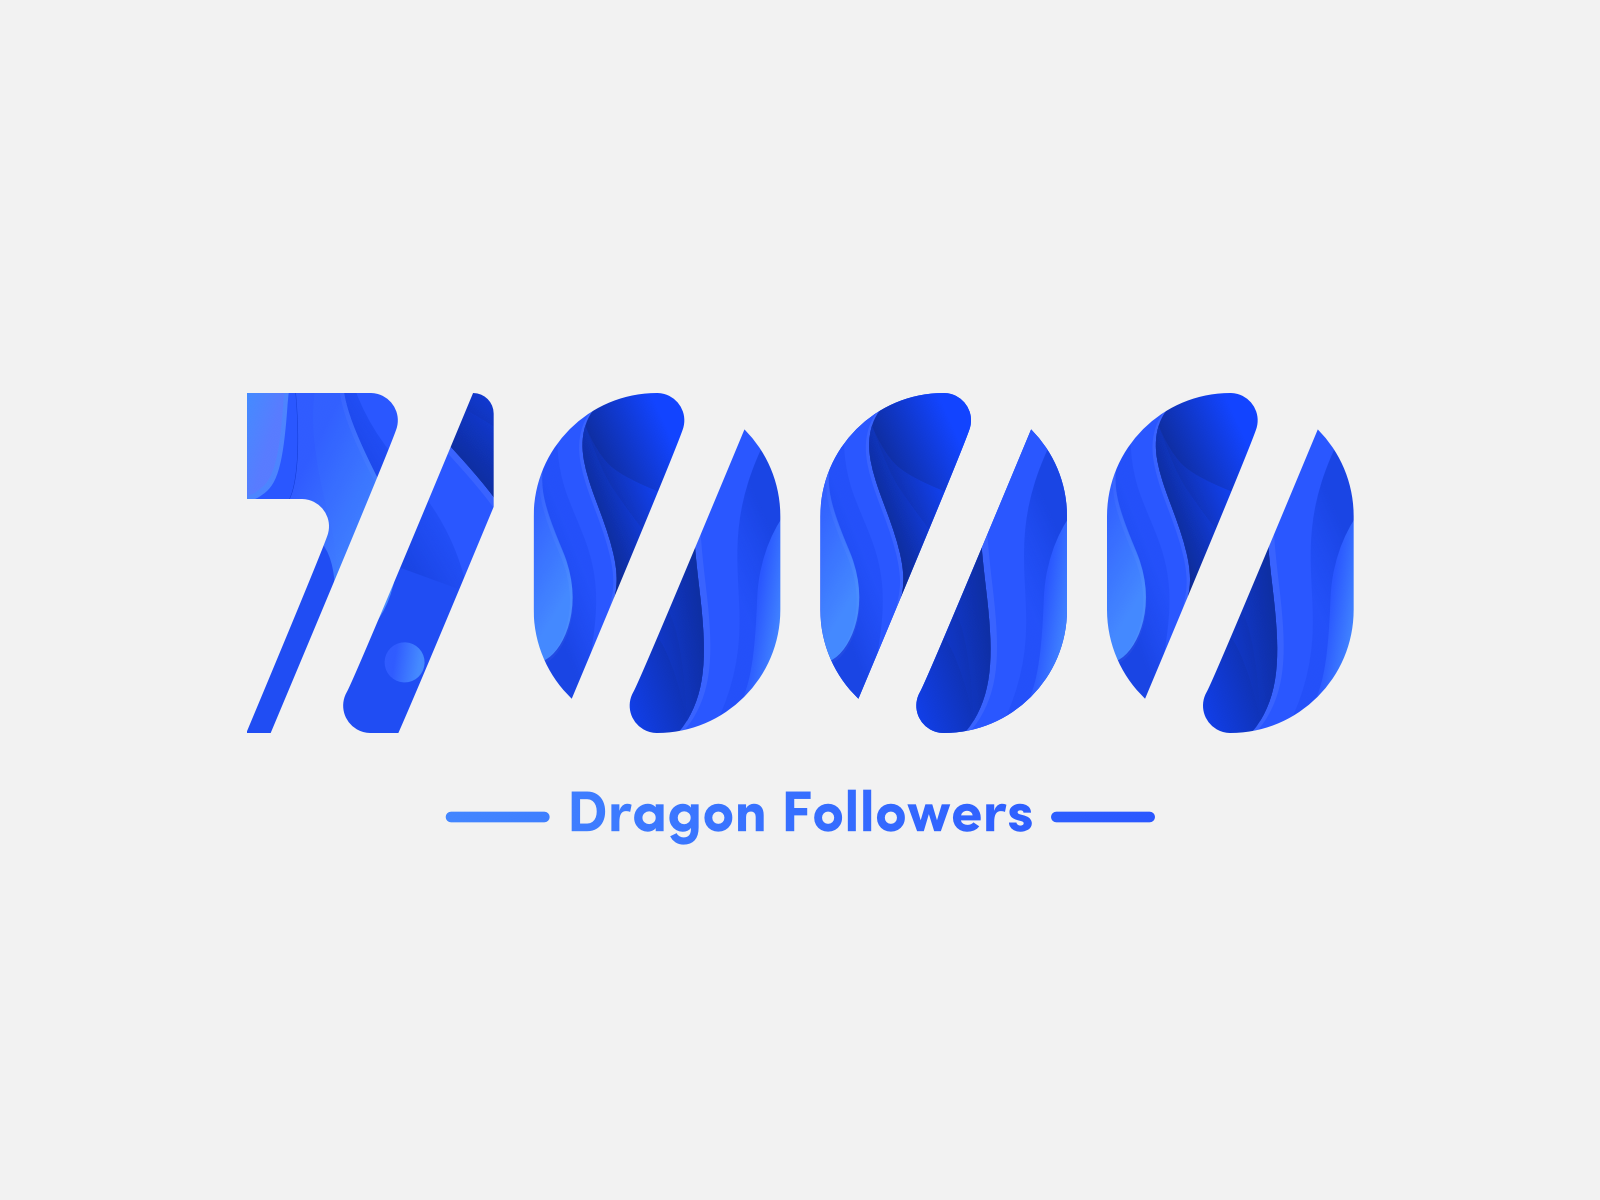 7000 followers